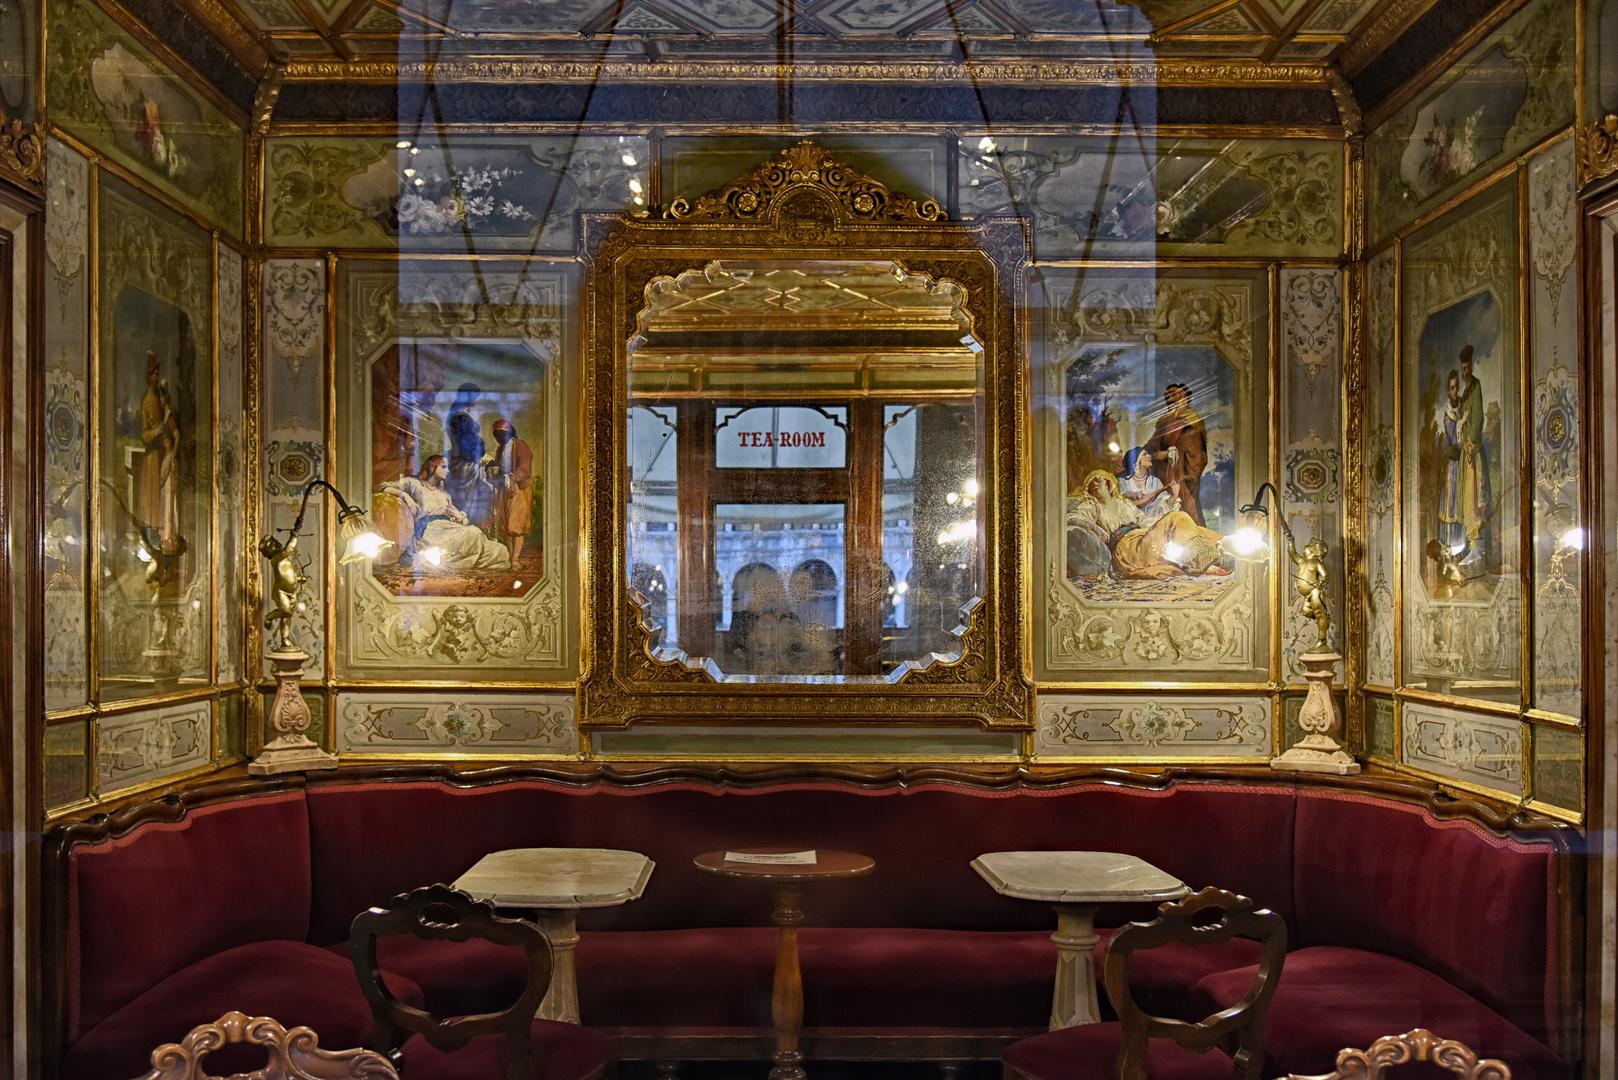 2020 11. Caffè Florian Piazza San Marco